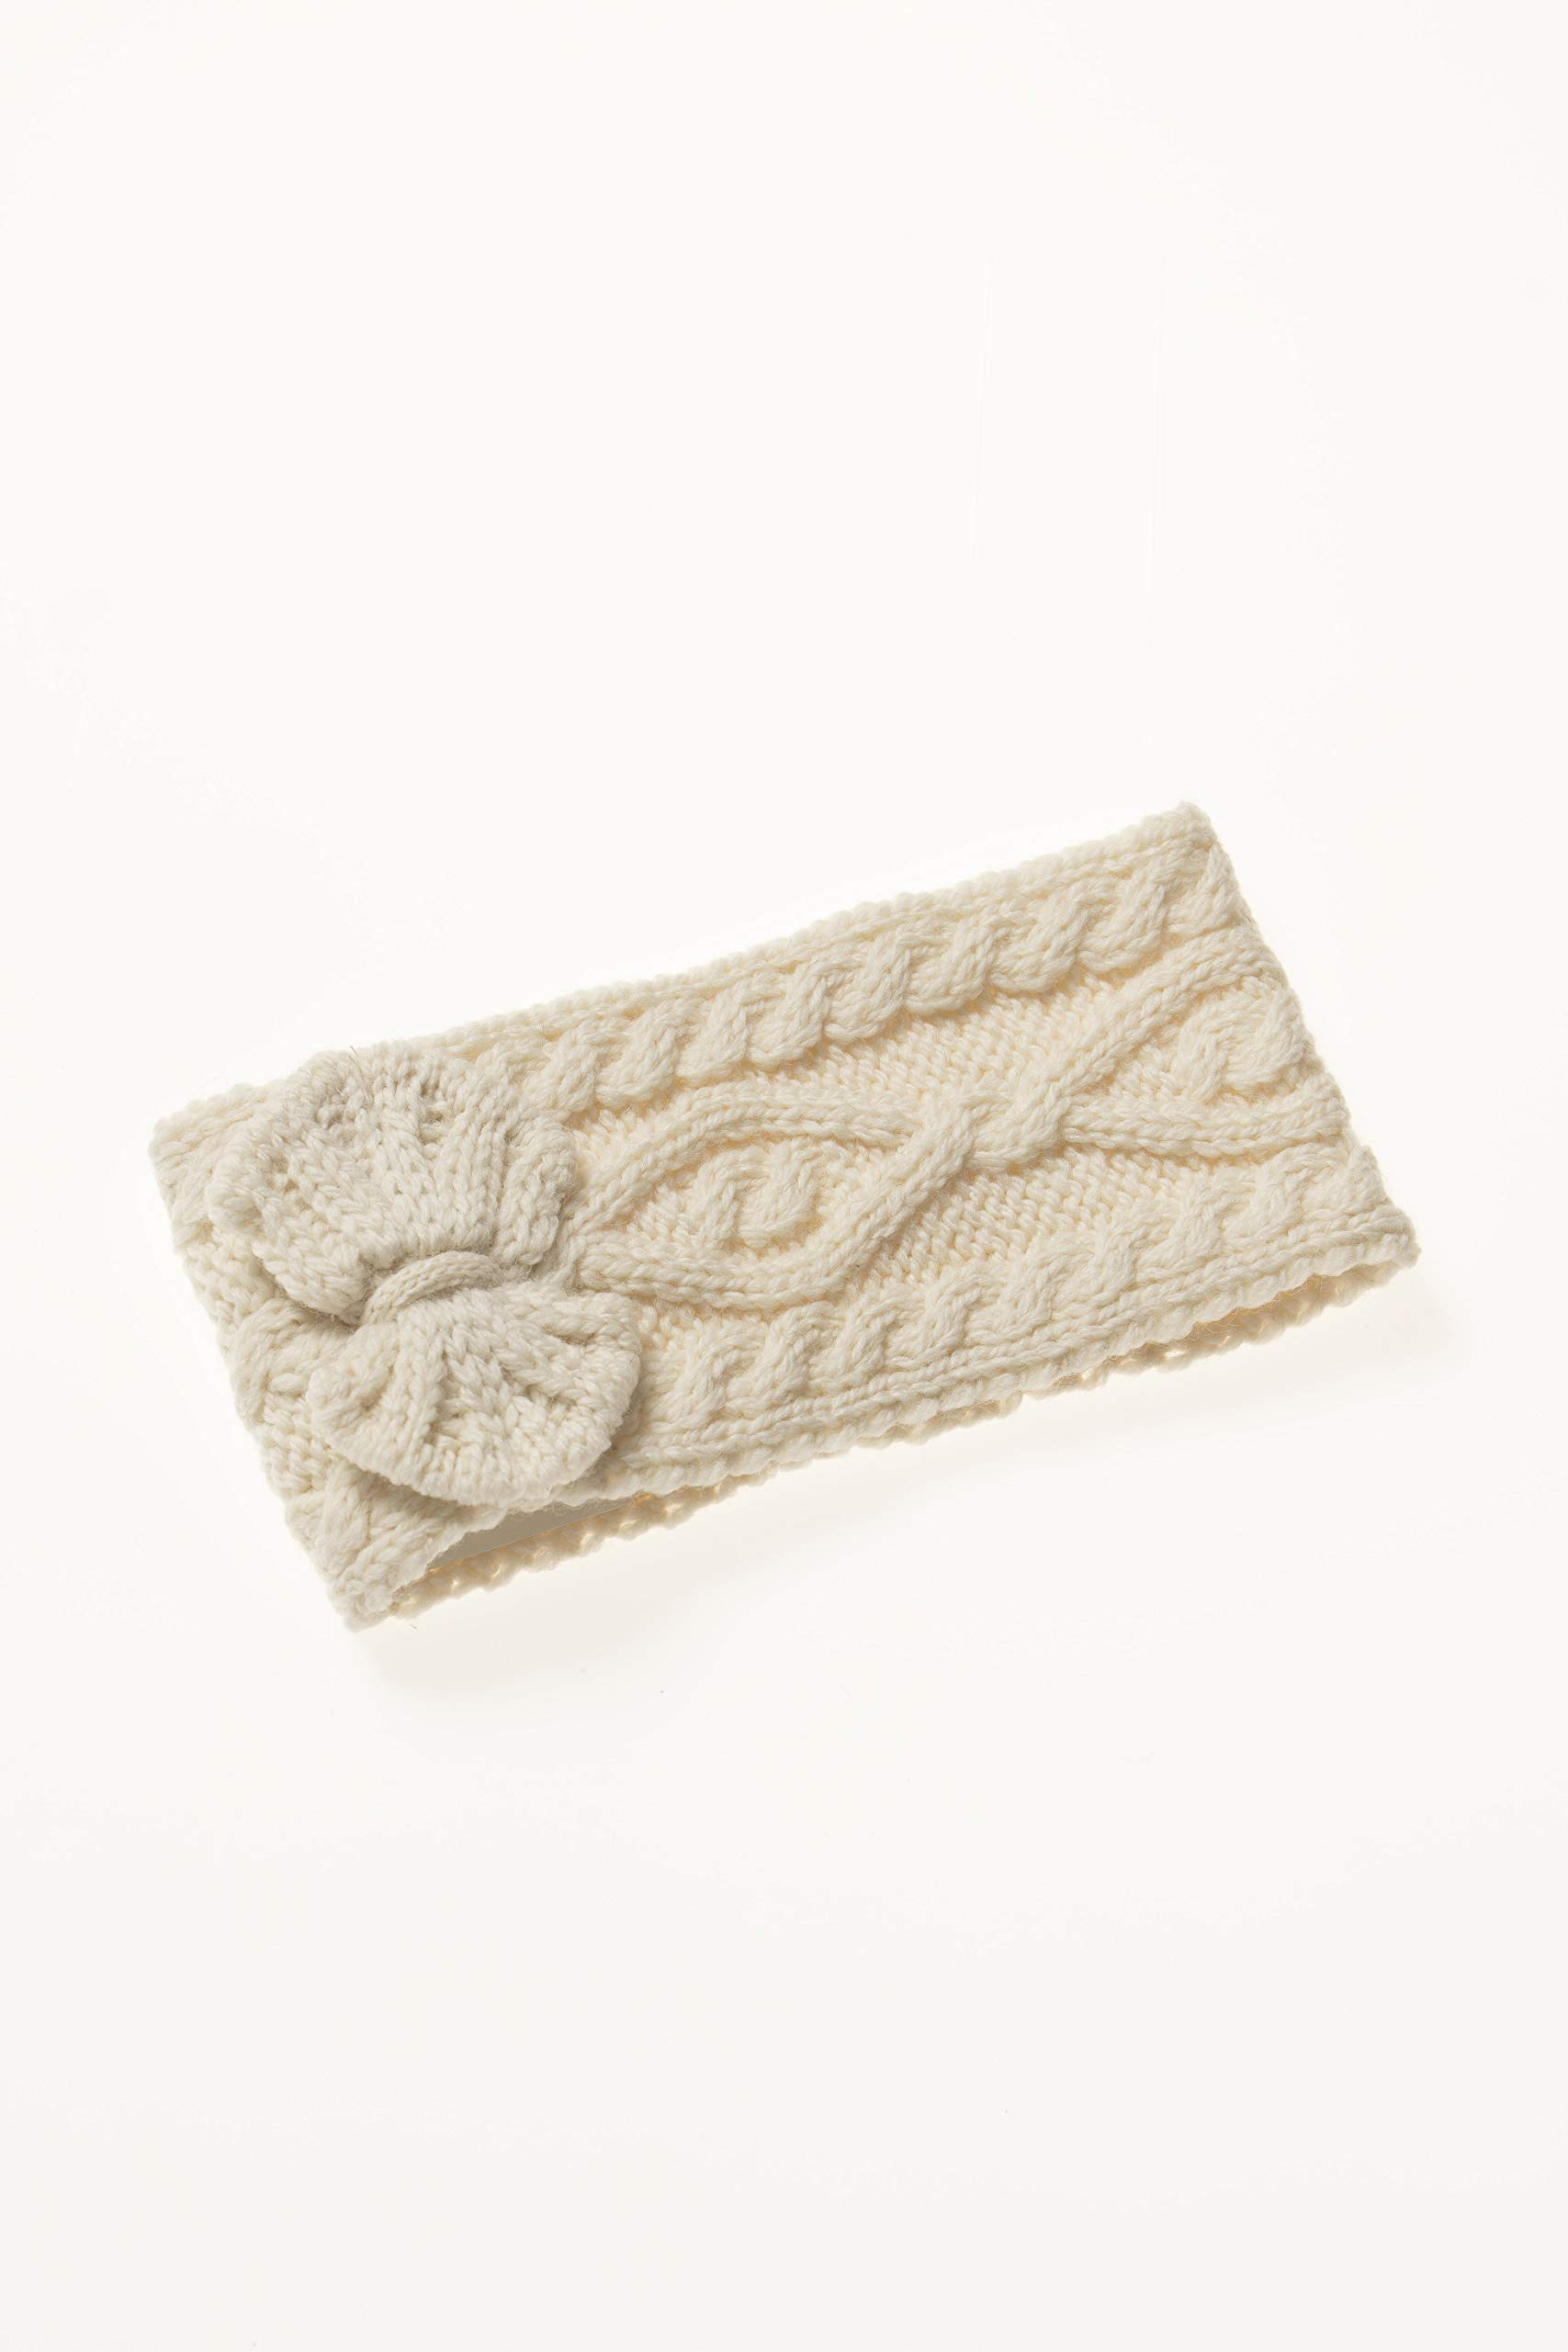 Aran Crafts Headband (100% Merino Wool) One Size Natural (X4341-NAT) by Aran Crafts Ireland (Image #5)